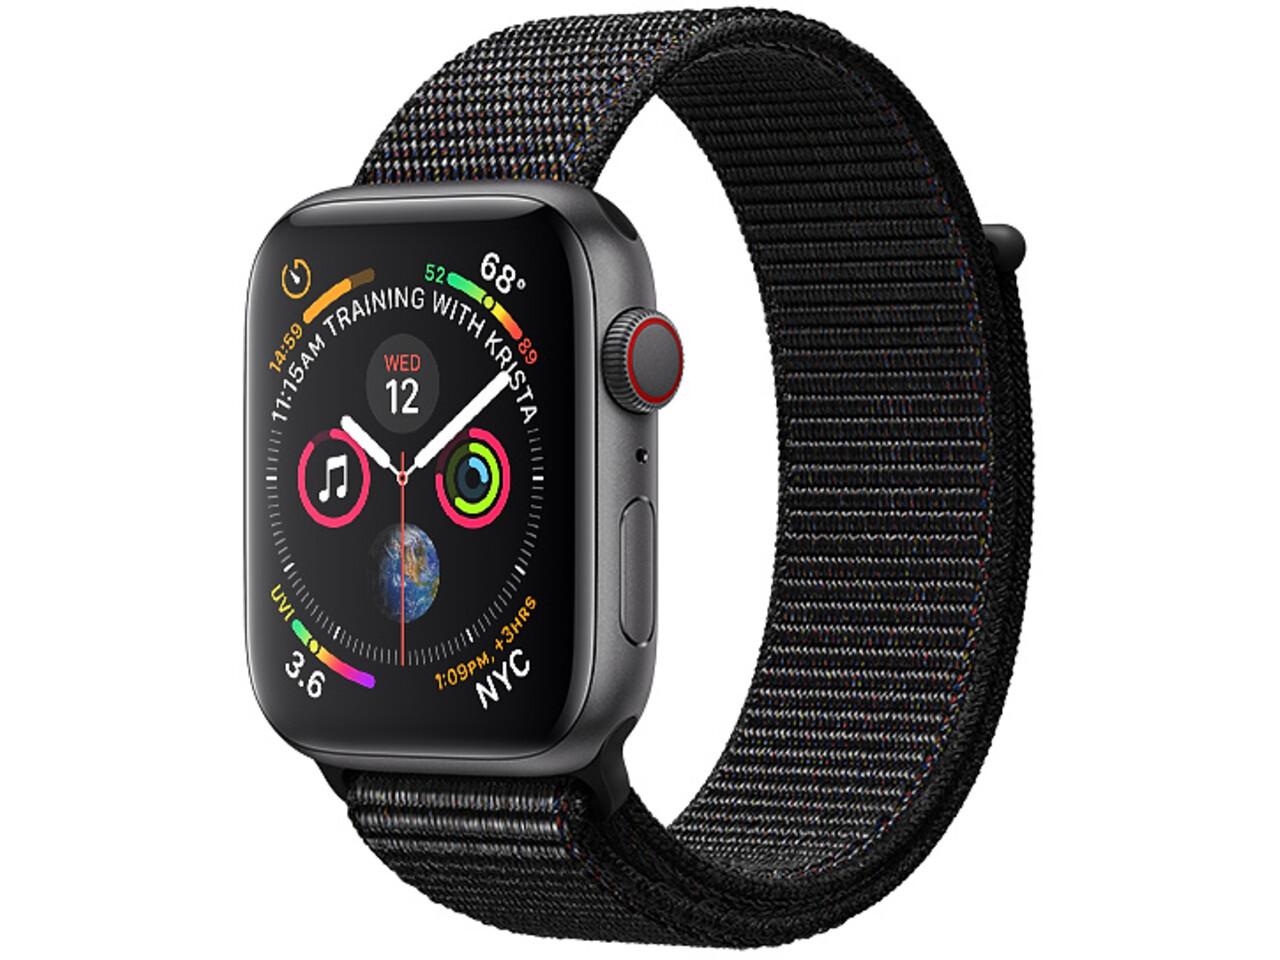 apple watch series 4 cellular 40mm space gray aluminum black sport loop